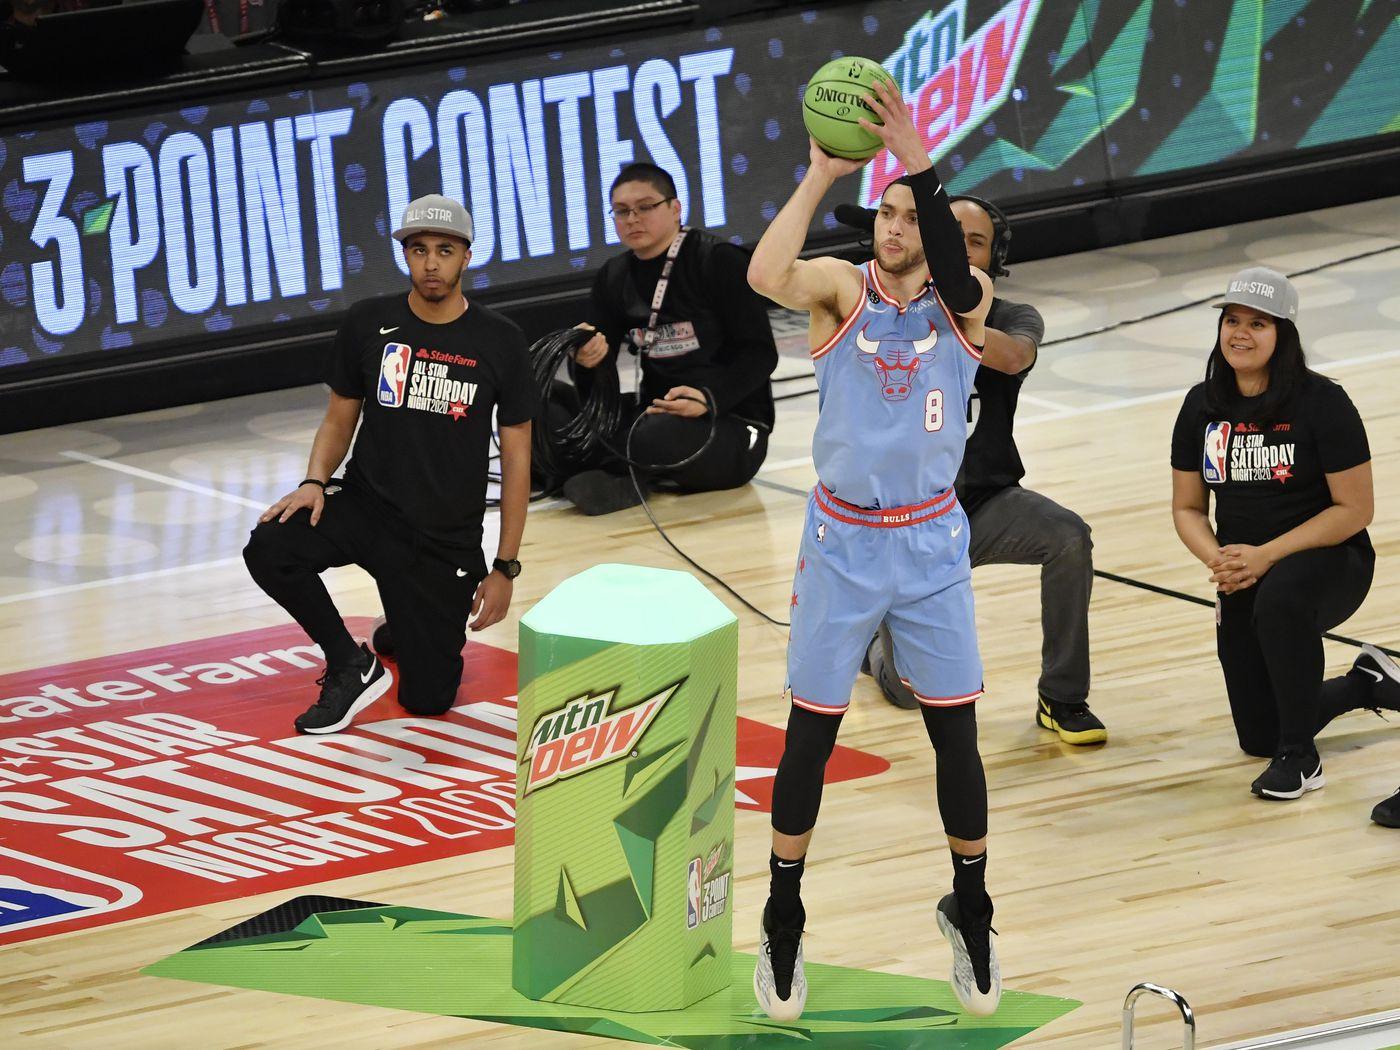 Bulls Zach LaVine fails to advance in 3 Point Contest   Blog a Bull 1400x1050